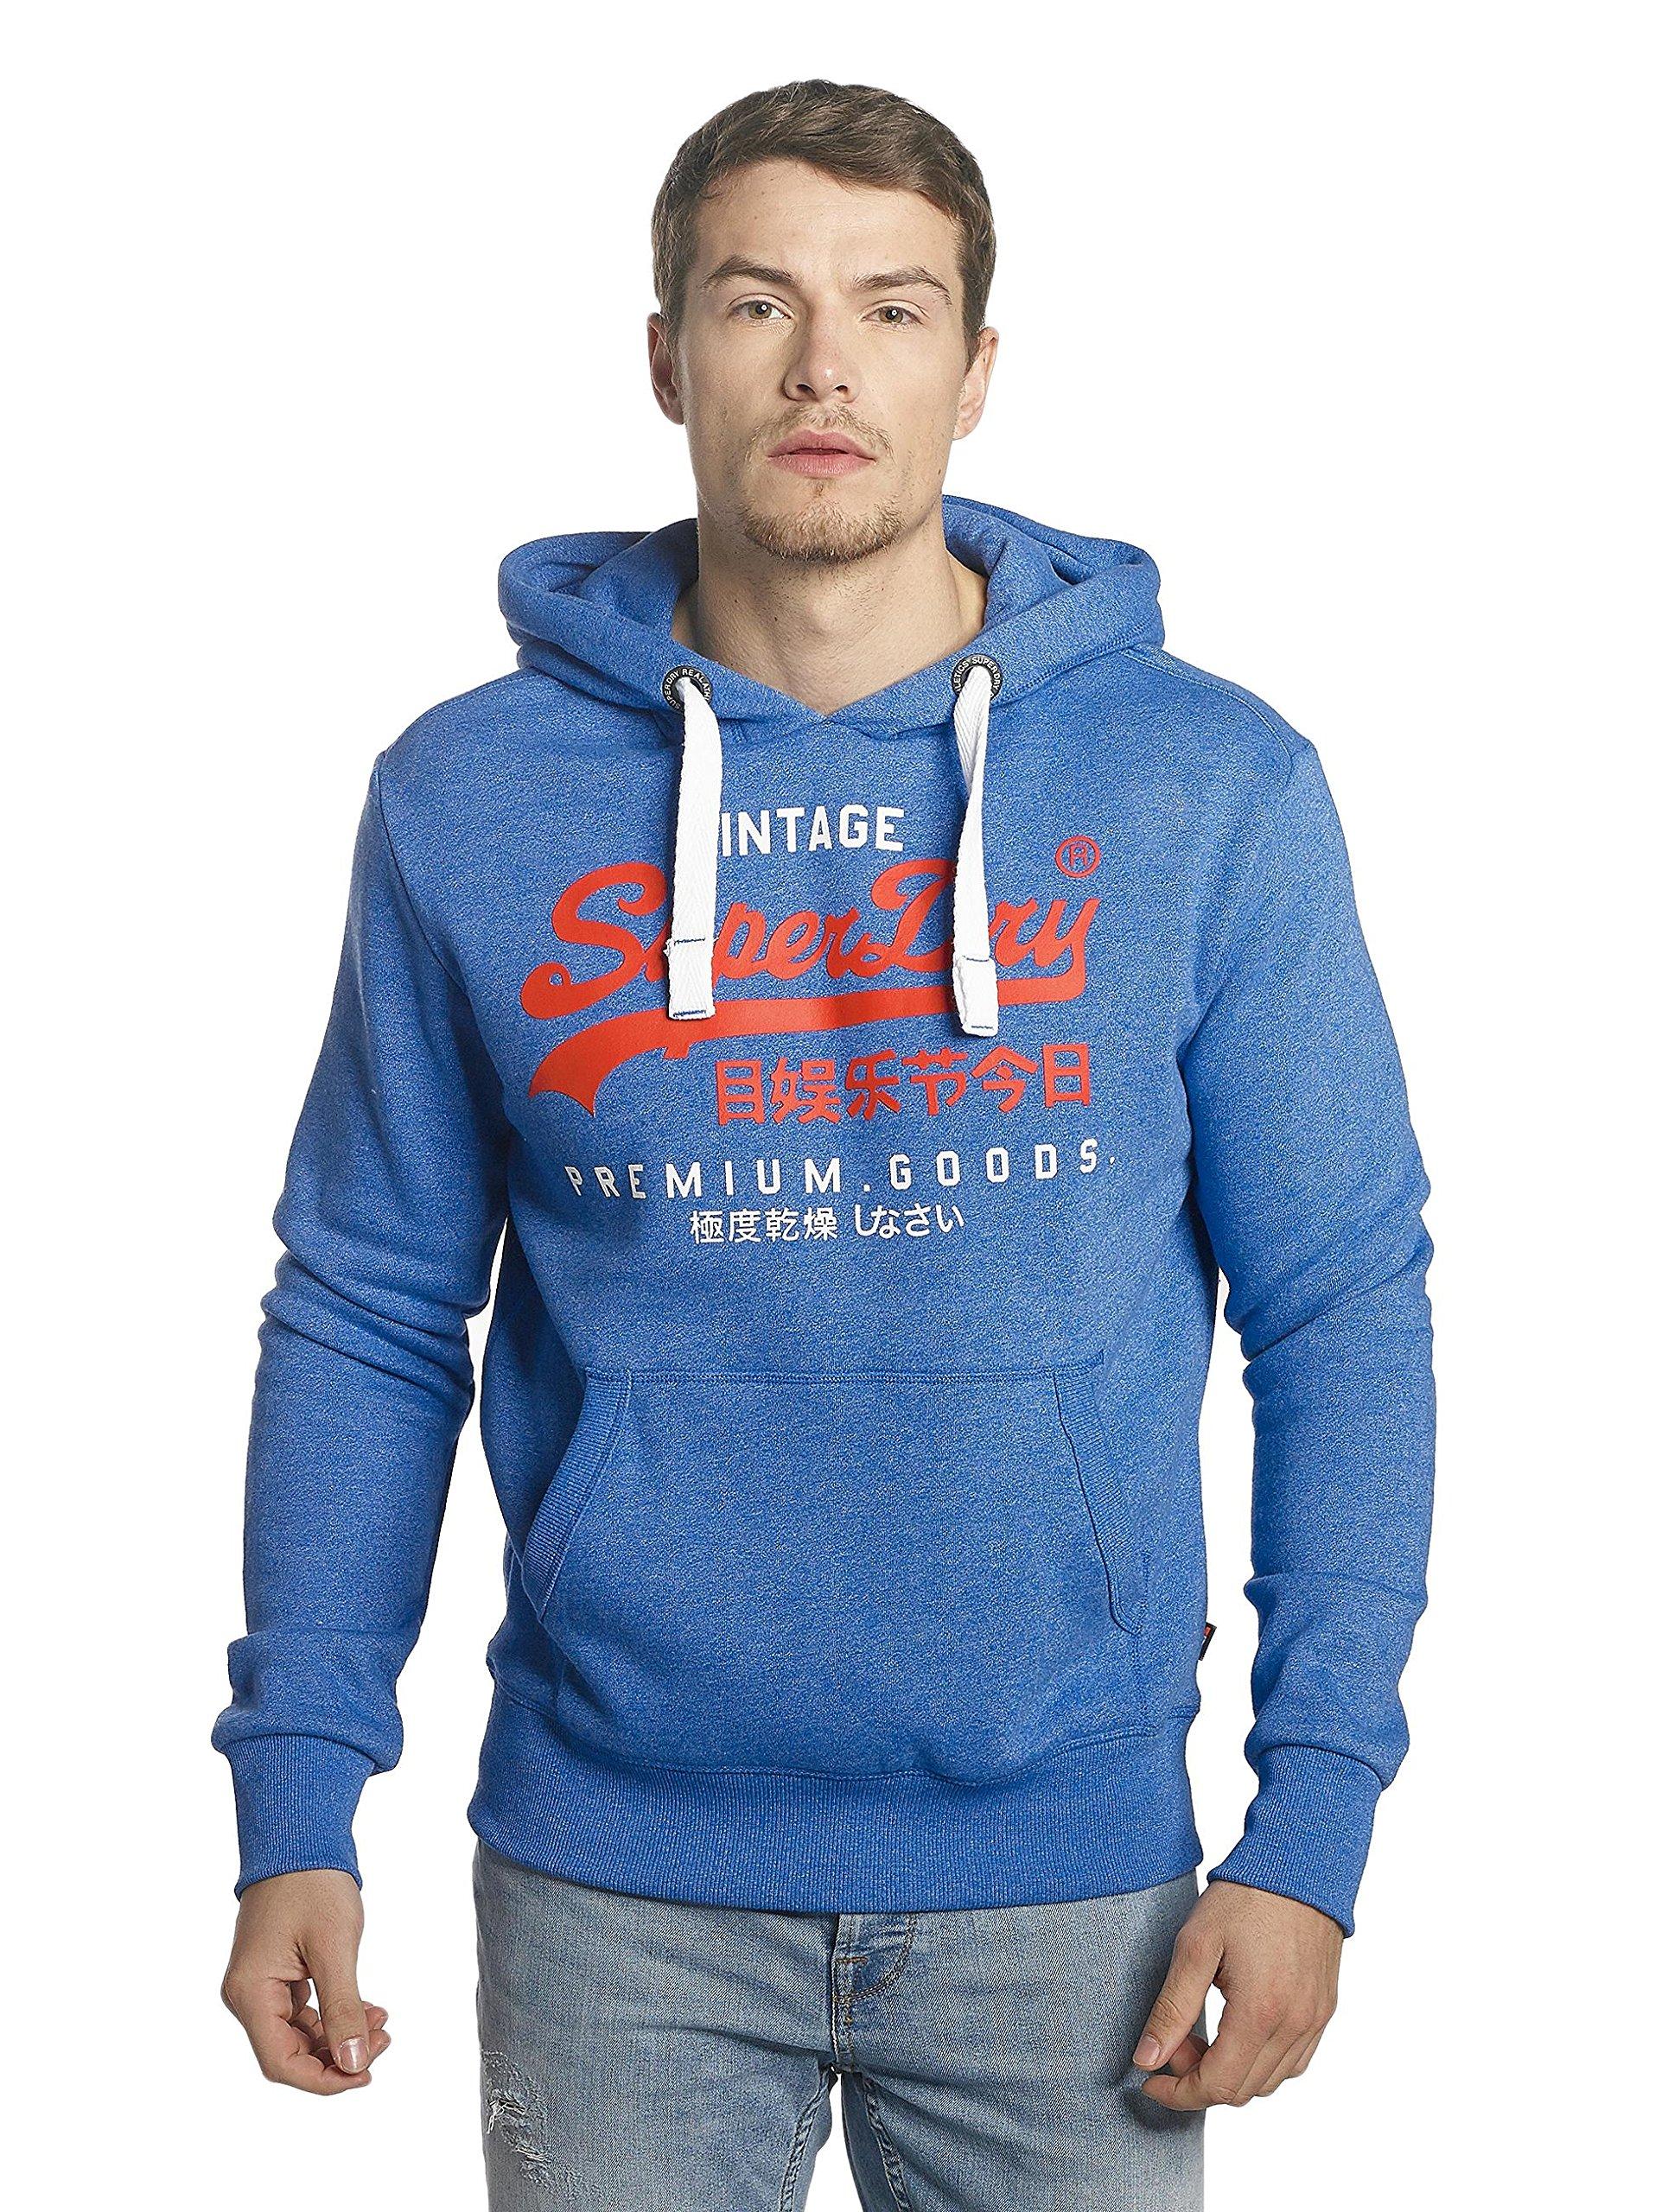 Superdry Men's Premium Goods Duo Pullover Hoodie, Blue, Large